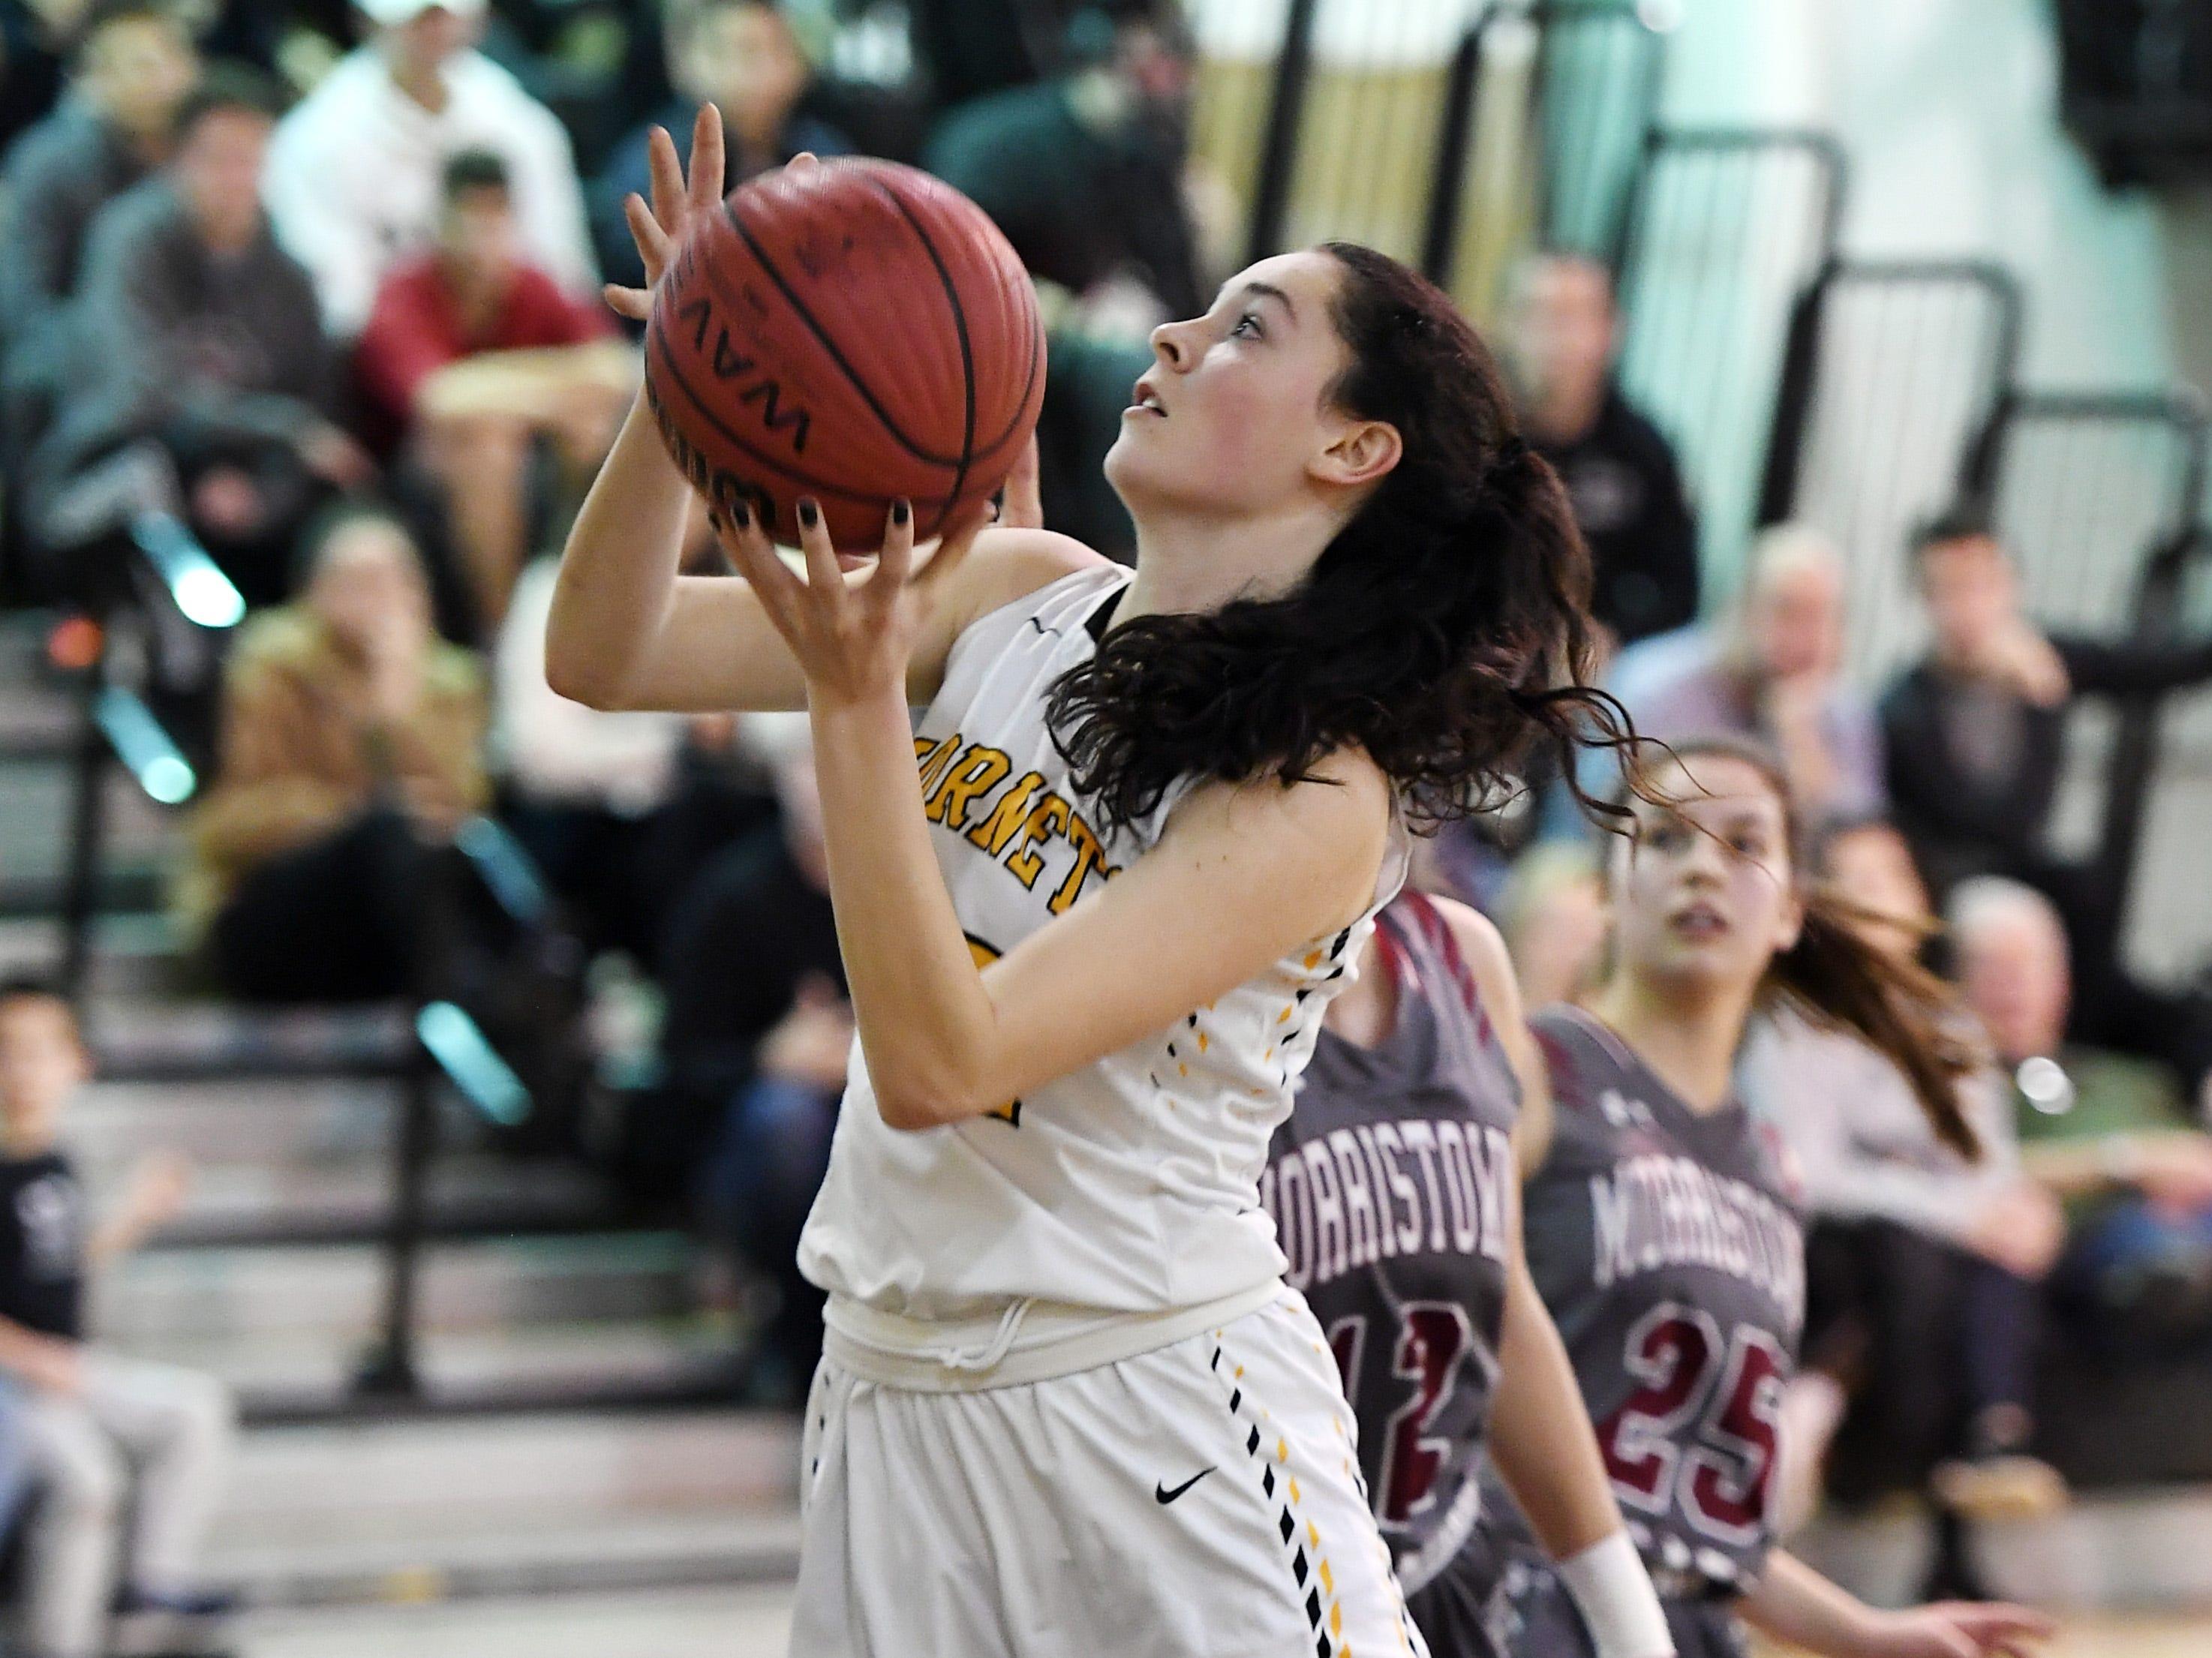 Morristown-Beard girls basketball at Hanover Park on Friday, January 4, 2019. HP #32 Meghan Macaluso drives to the basket.